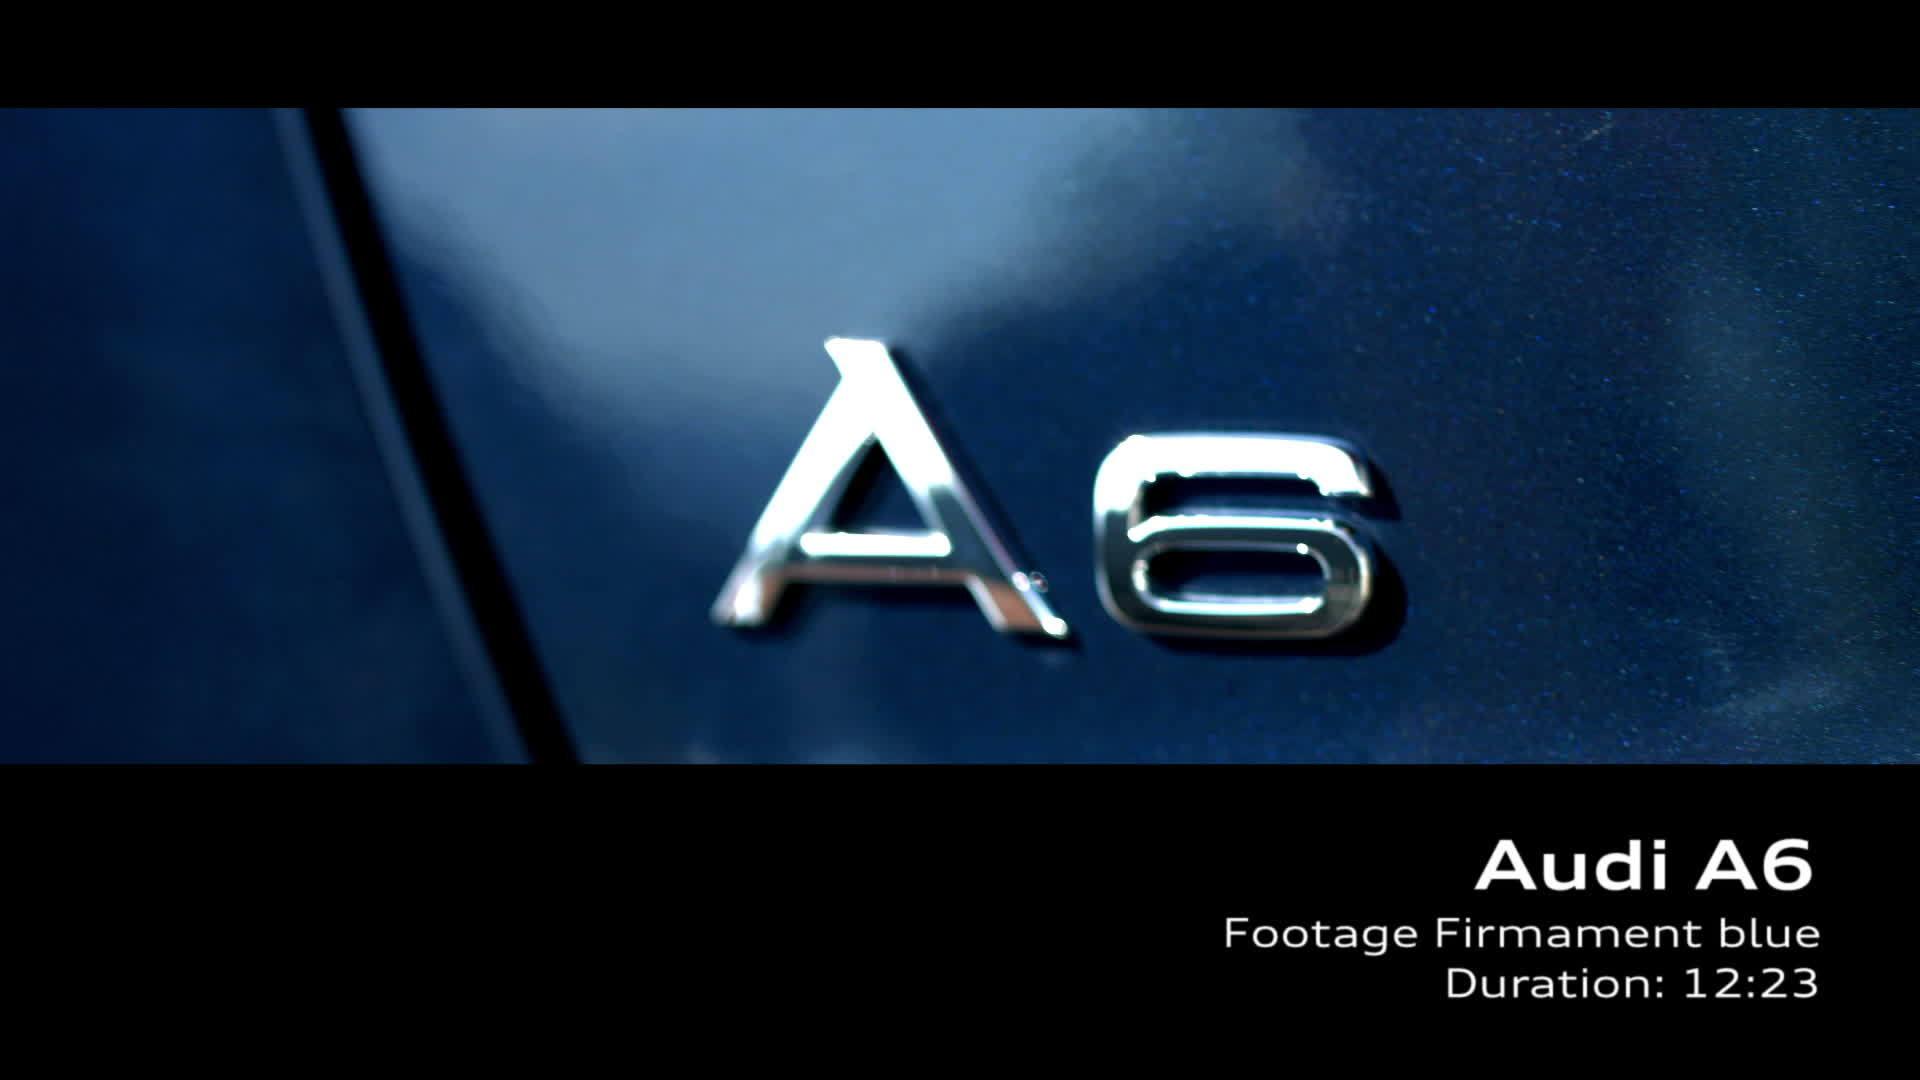 Audi A6 Footage Firmamentblau